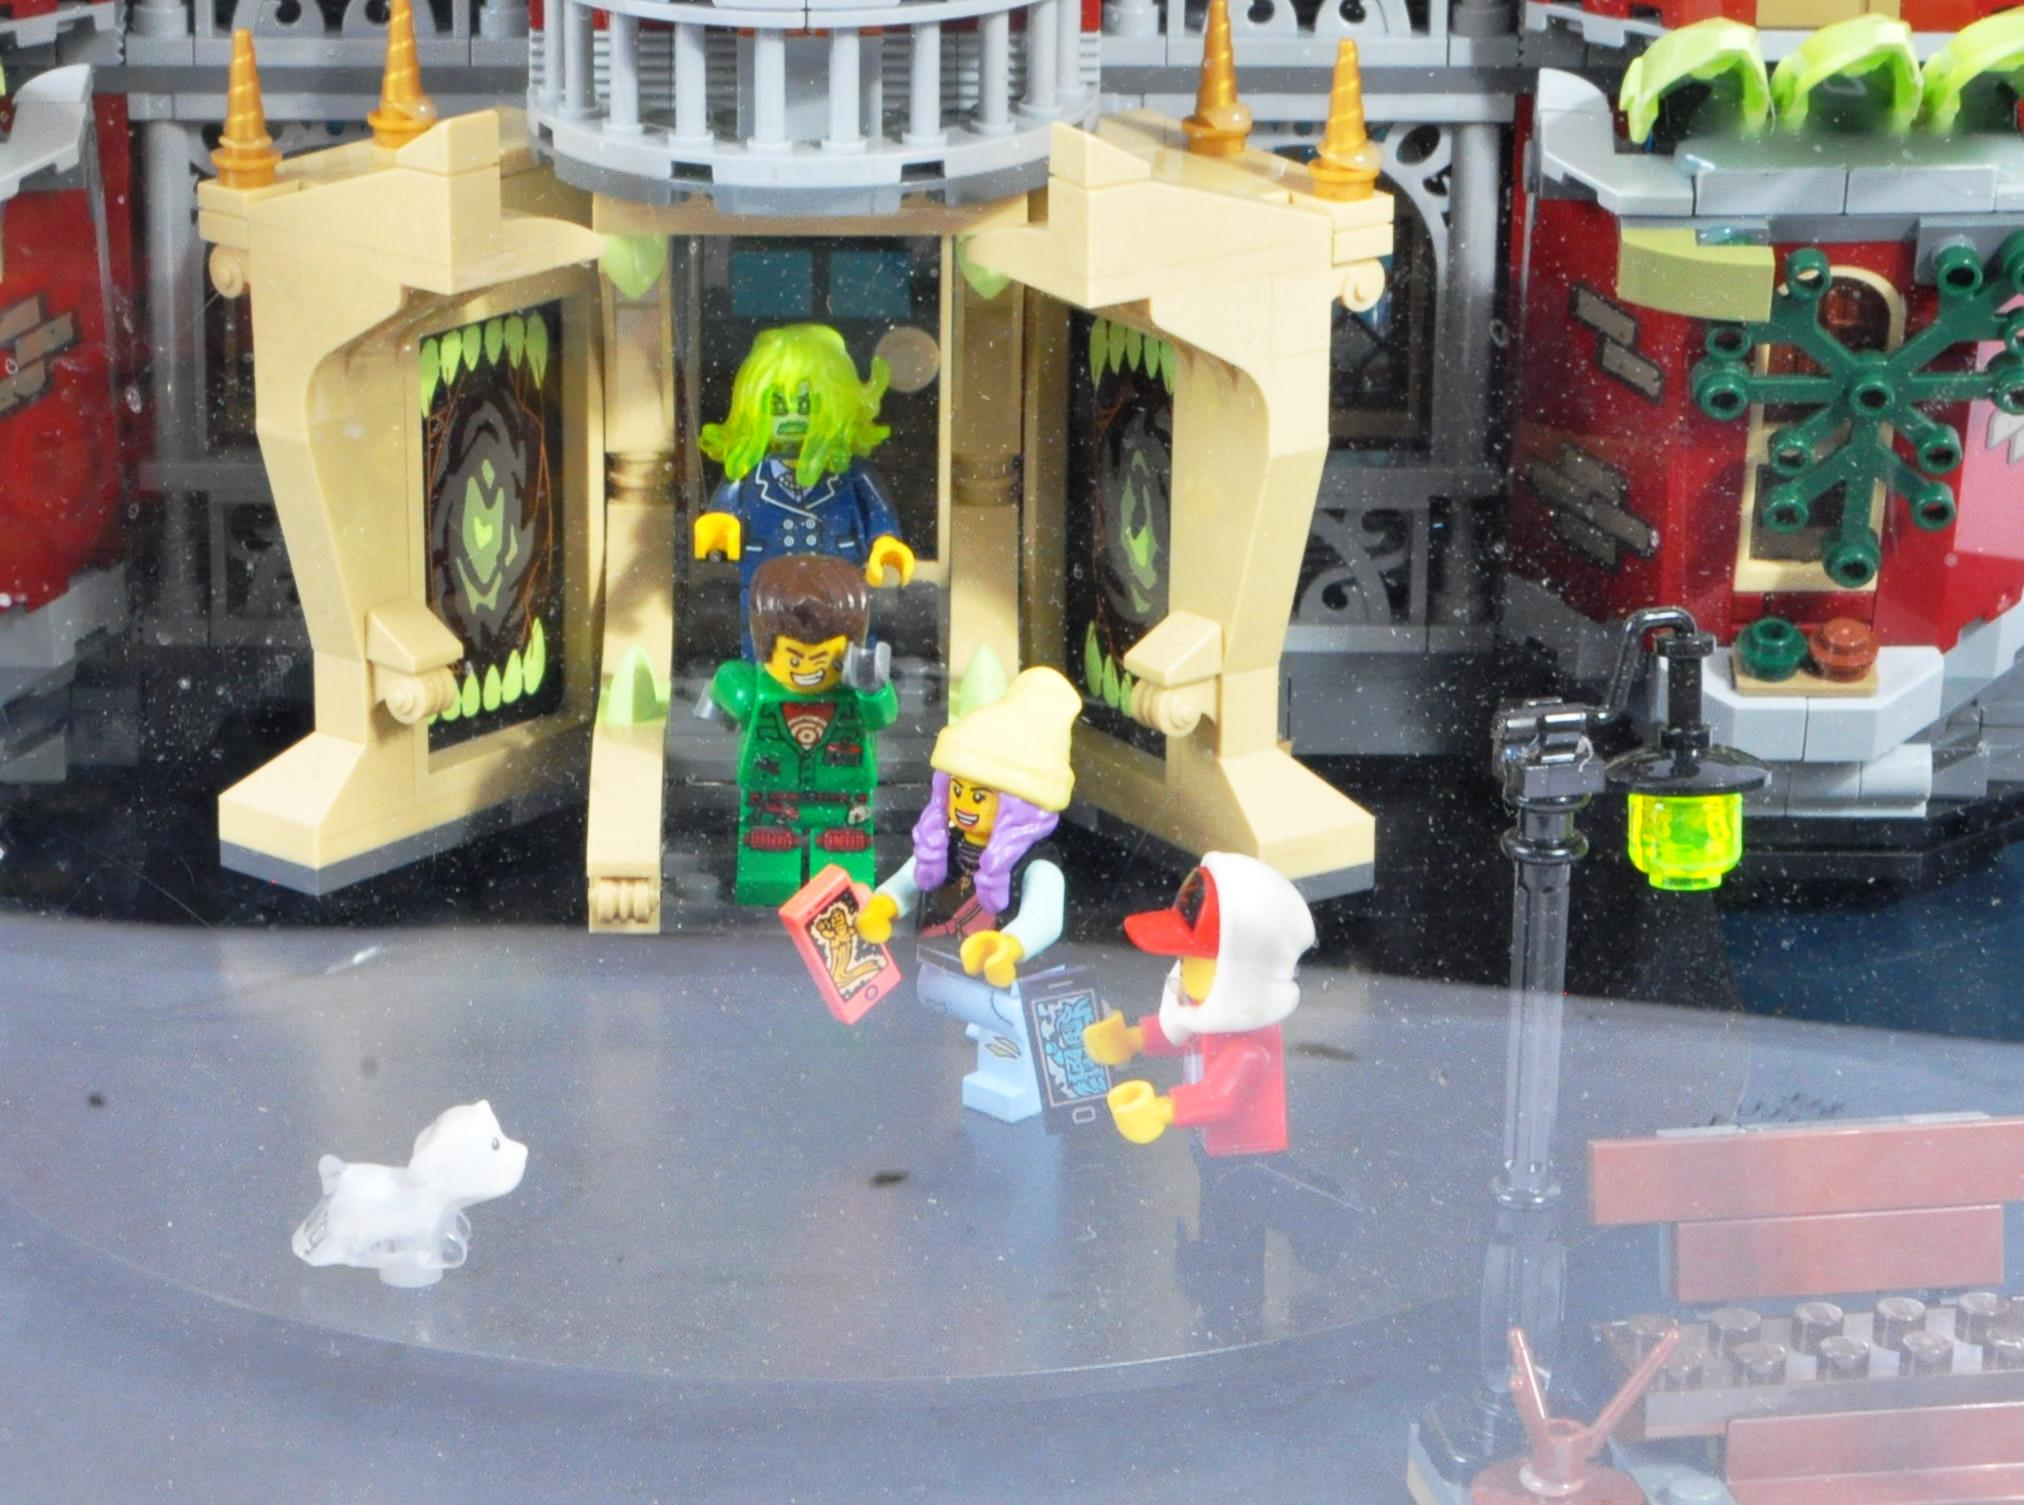 LEGO - HIDDEN SIDE - ORIGINAL IN STORE SHOP DISPLAY CABINET - Image 7 of 8